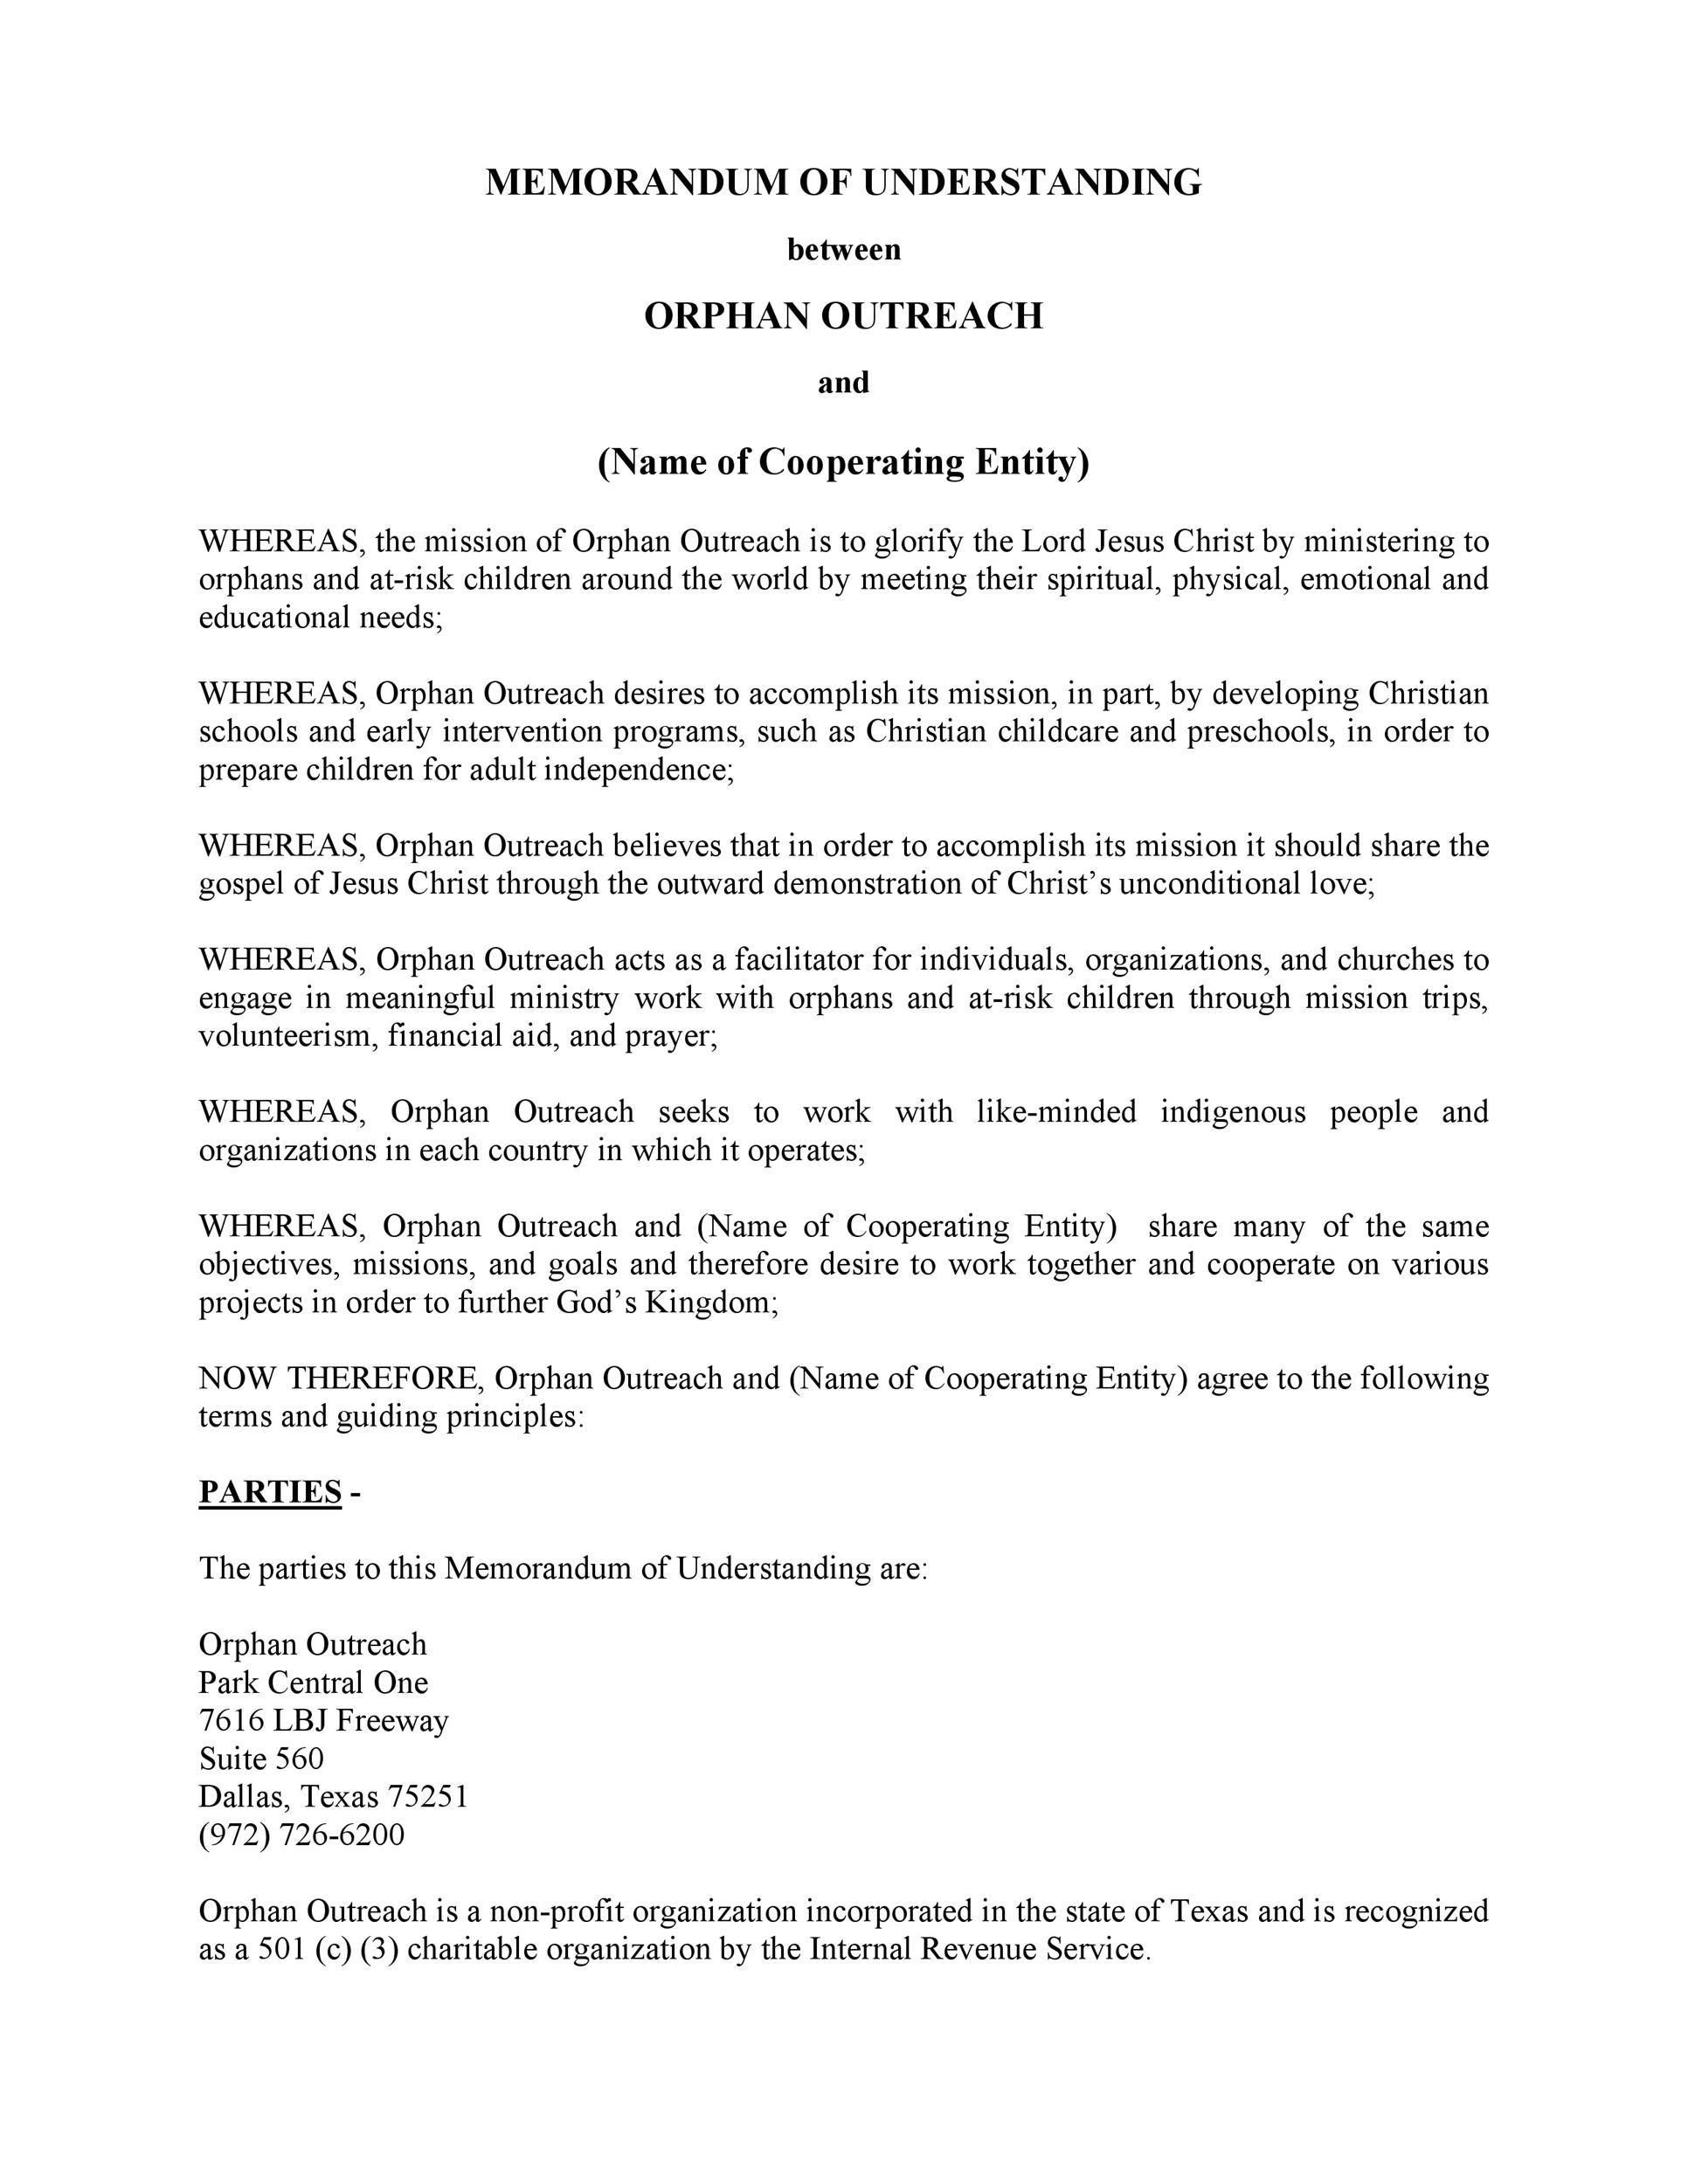 Free Memorandum of Understanding Template 43